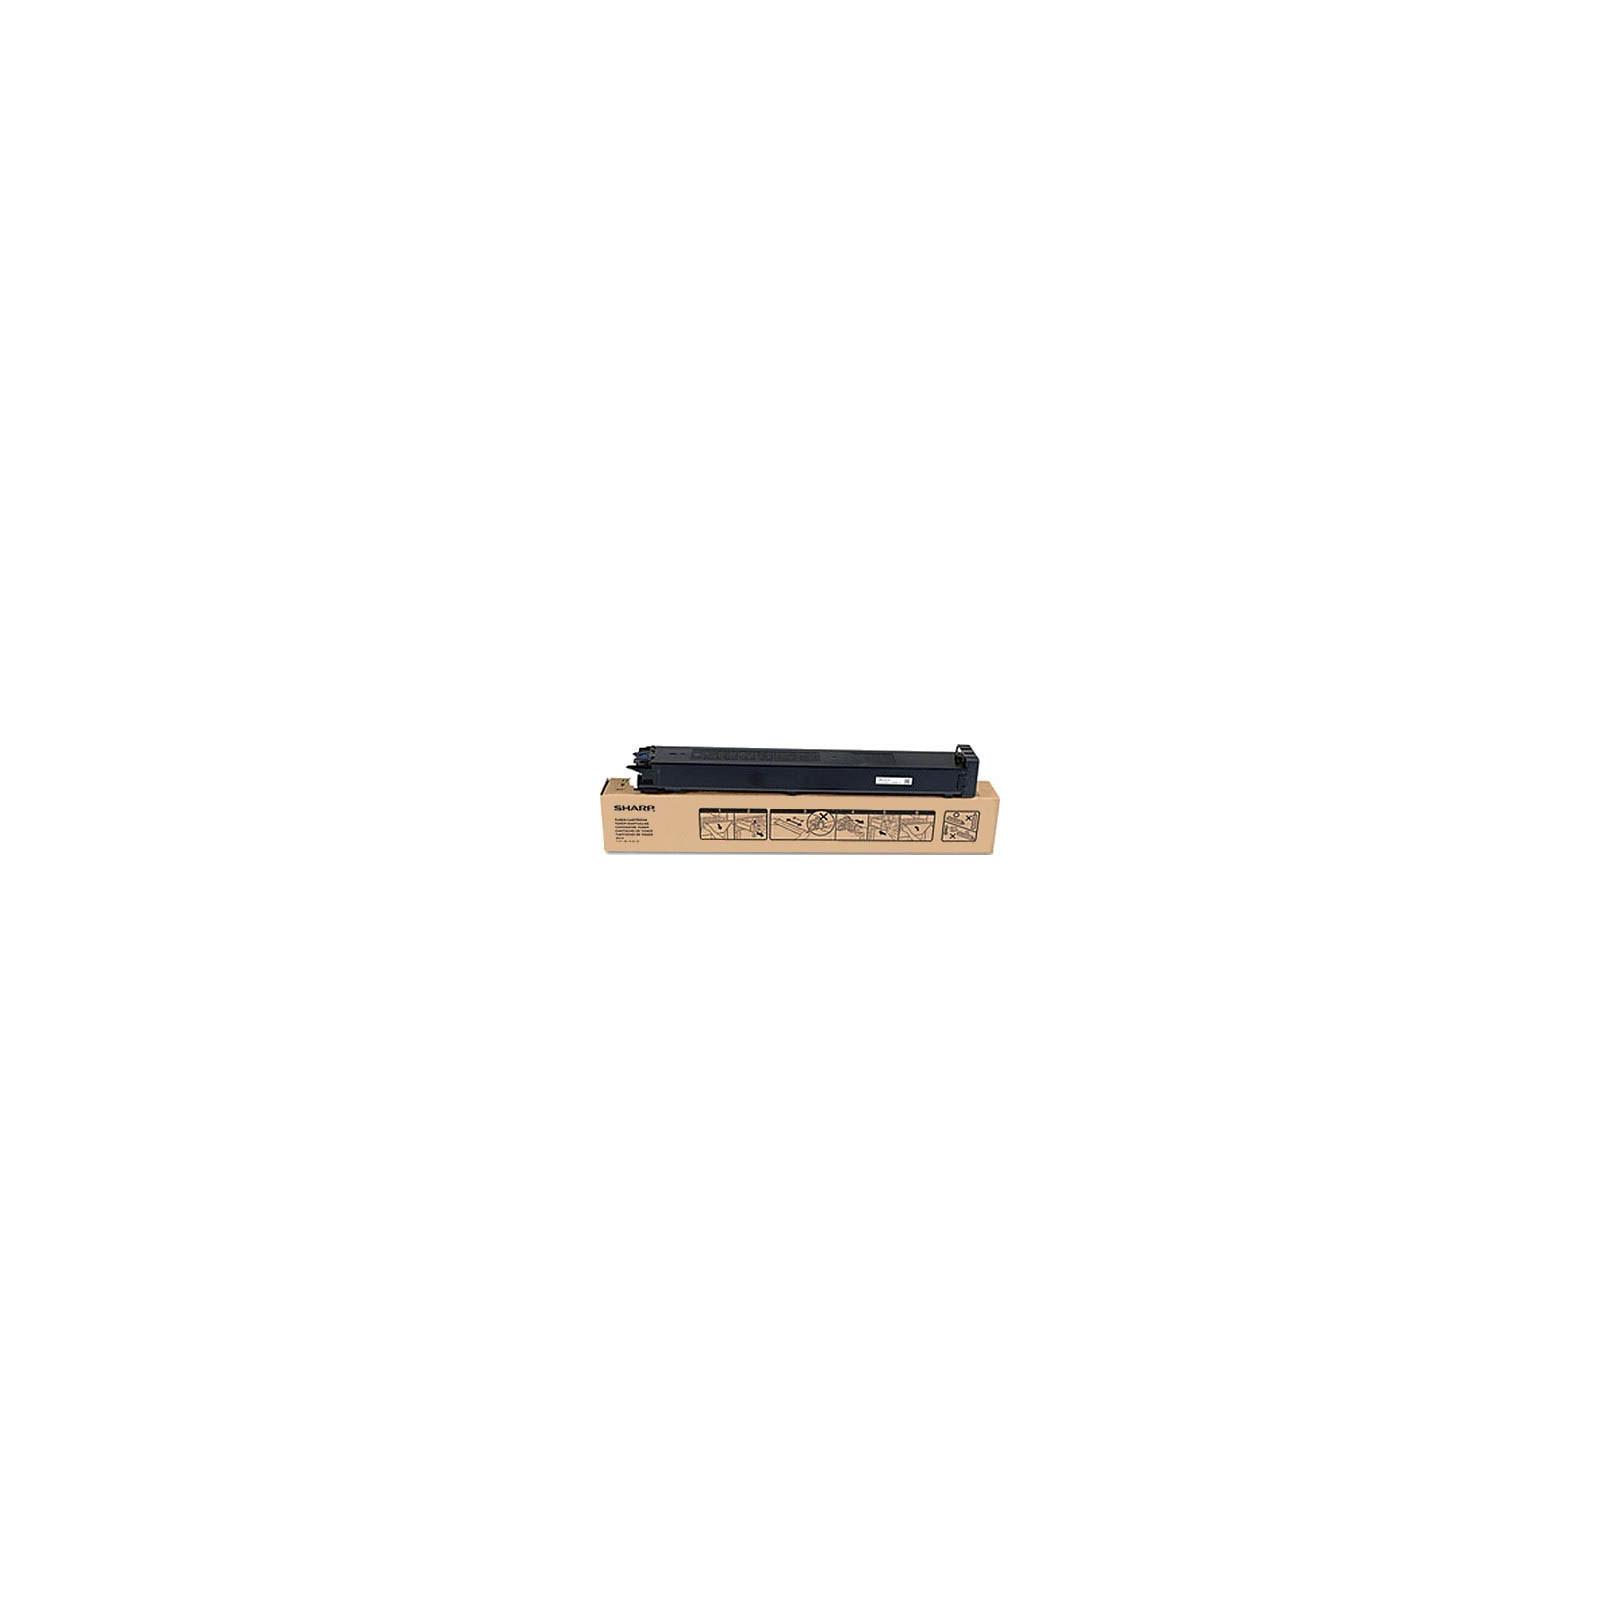 Тонер-картридж SHARP MX 23GTBA Black (дляMX-2010U/2310U) (MX-23GTBA)